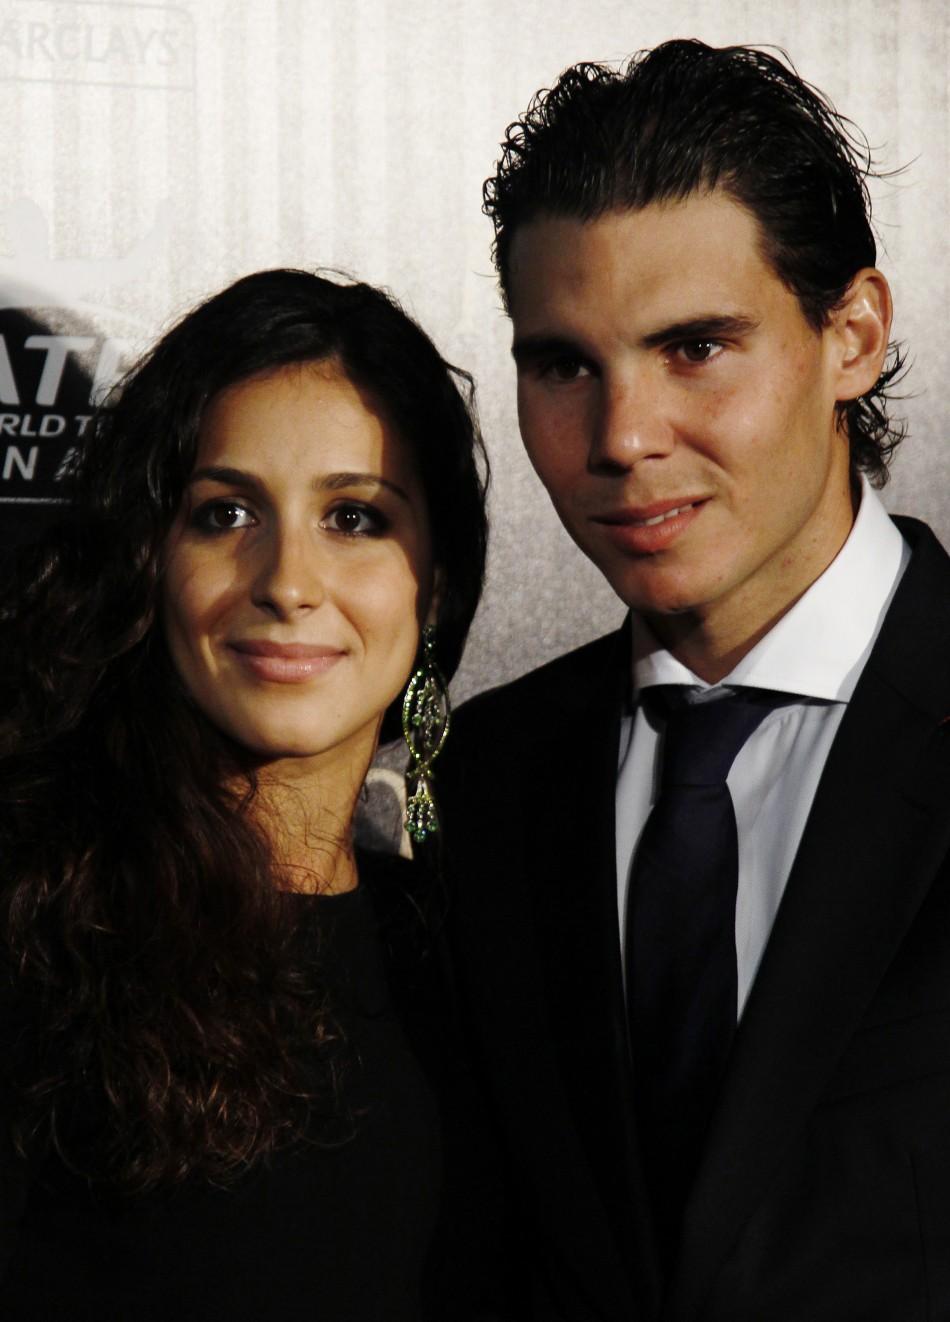 New Sports Stars: Rafael Nadal Girlfriend Maria Perello